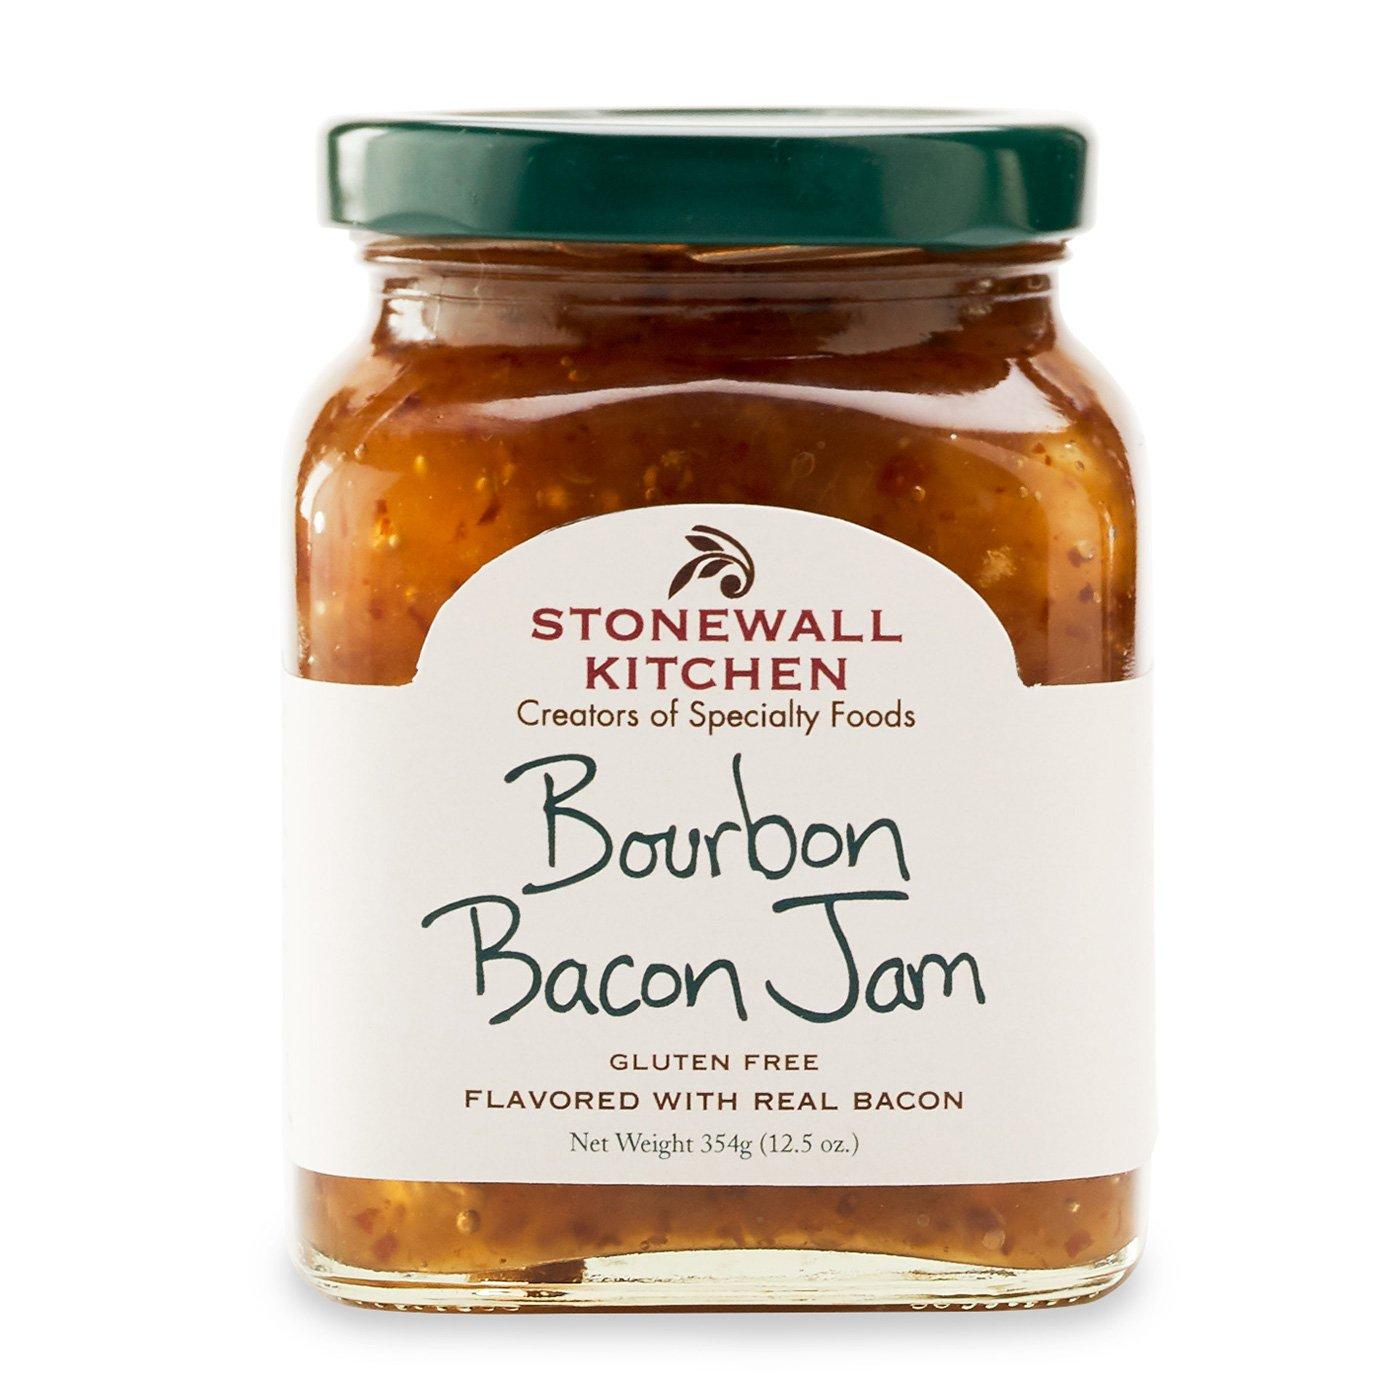 Stonewall Kitchen Bourbon Bacon Jam, 12.5 Ounce